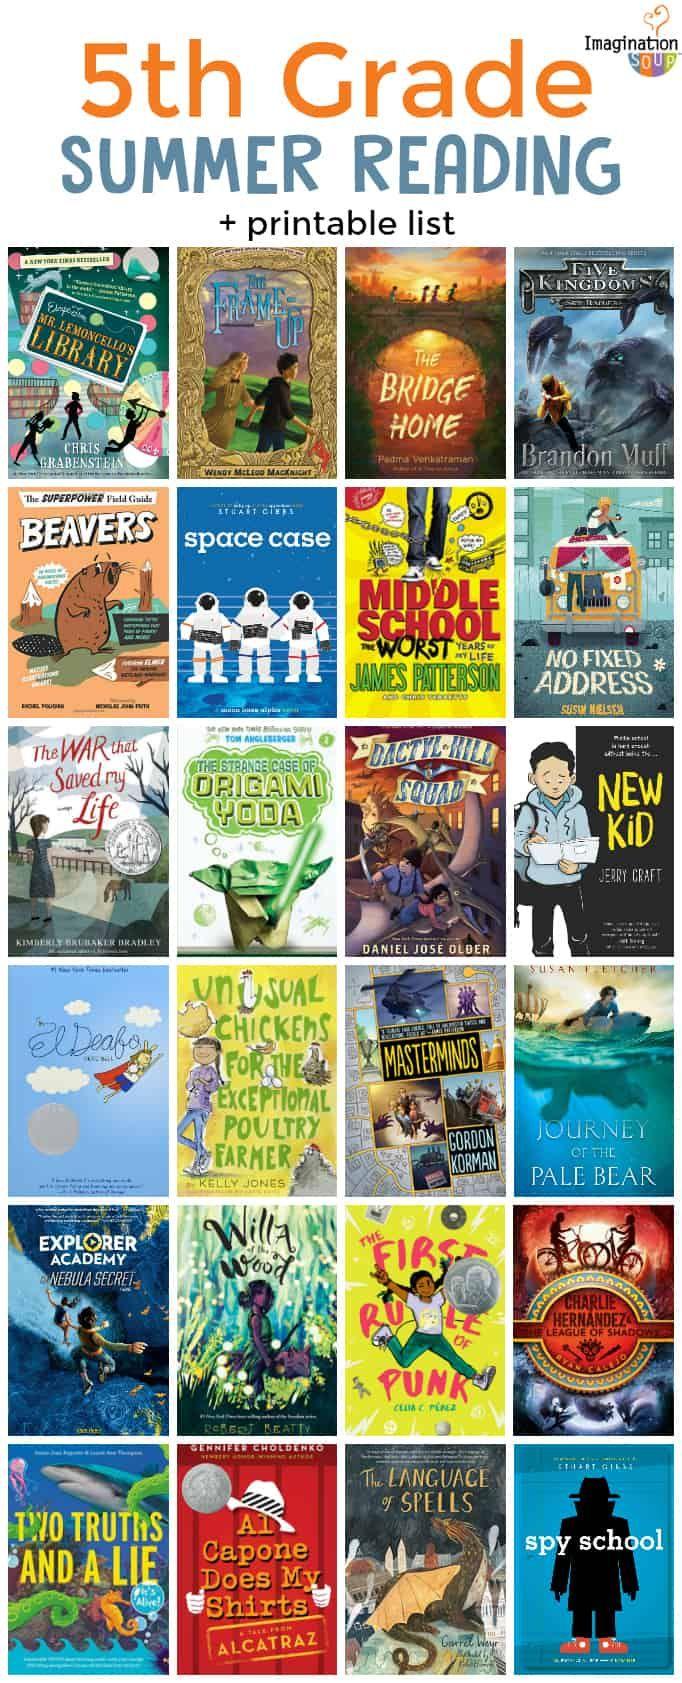 5th Grade Summer Reading List Ages 10 11 Kids Summer Reading Summer Reading Summer Reading Lists What books should grade be reading